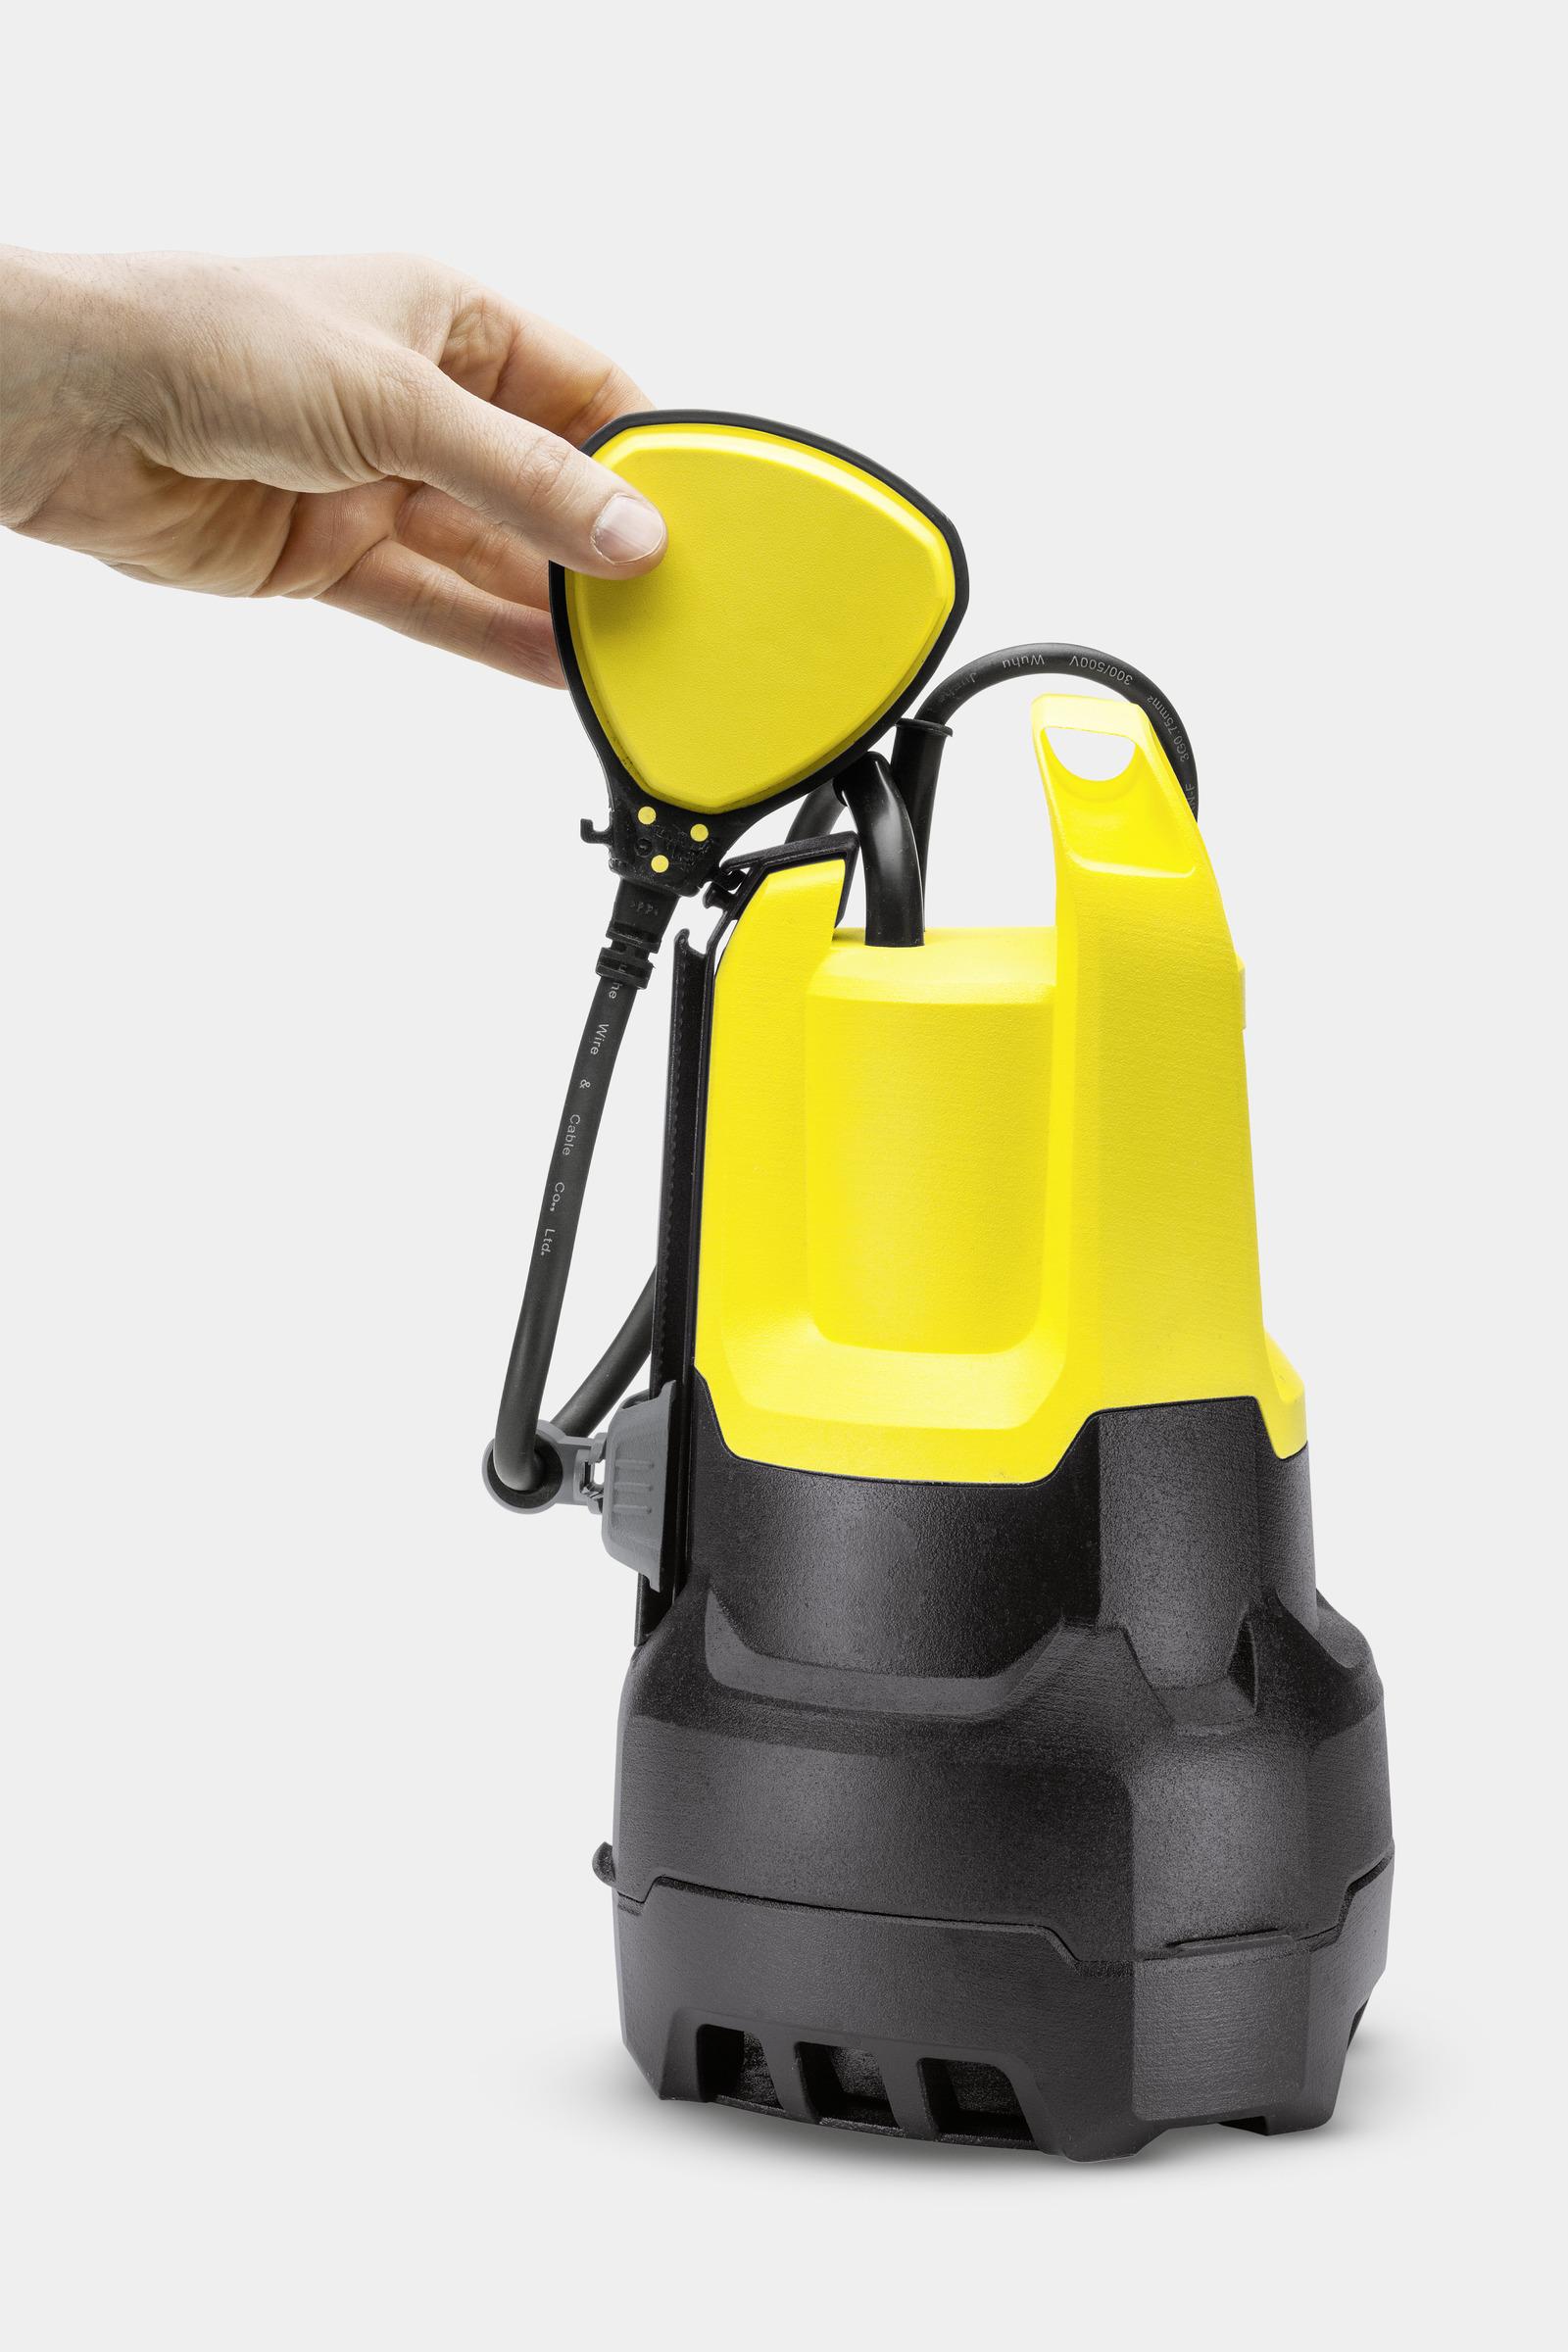 Karcher_1.645-513.0_Submersible Pump 1 - SP5 Submersible Dirty Pump